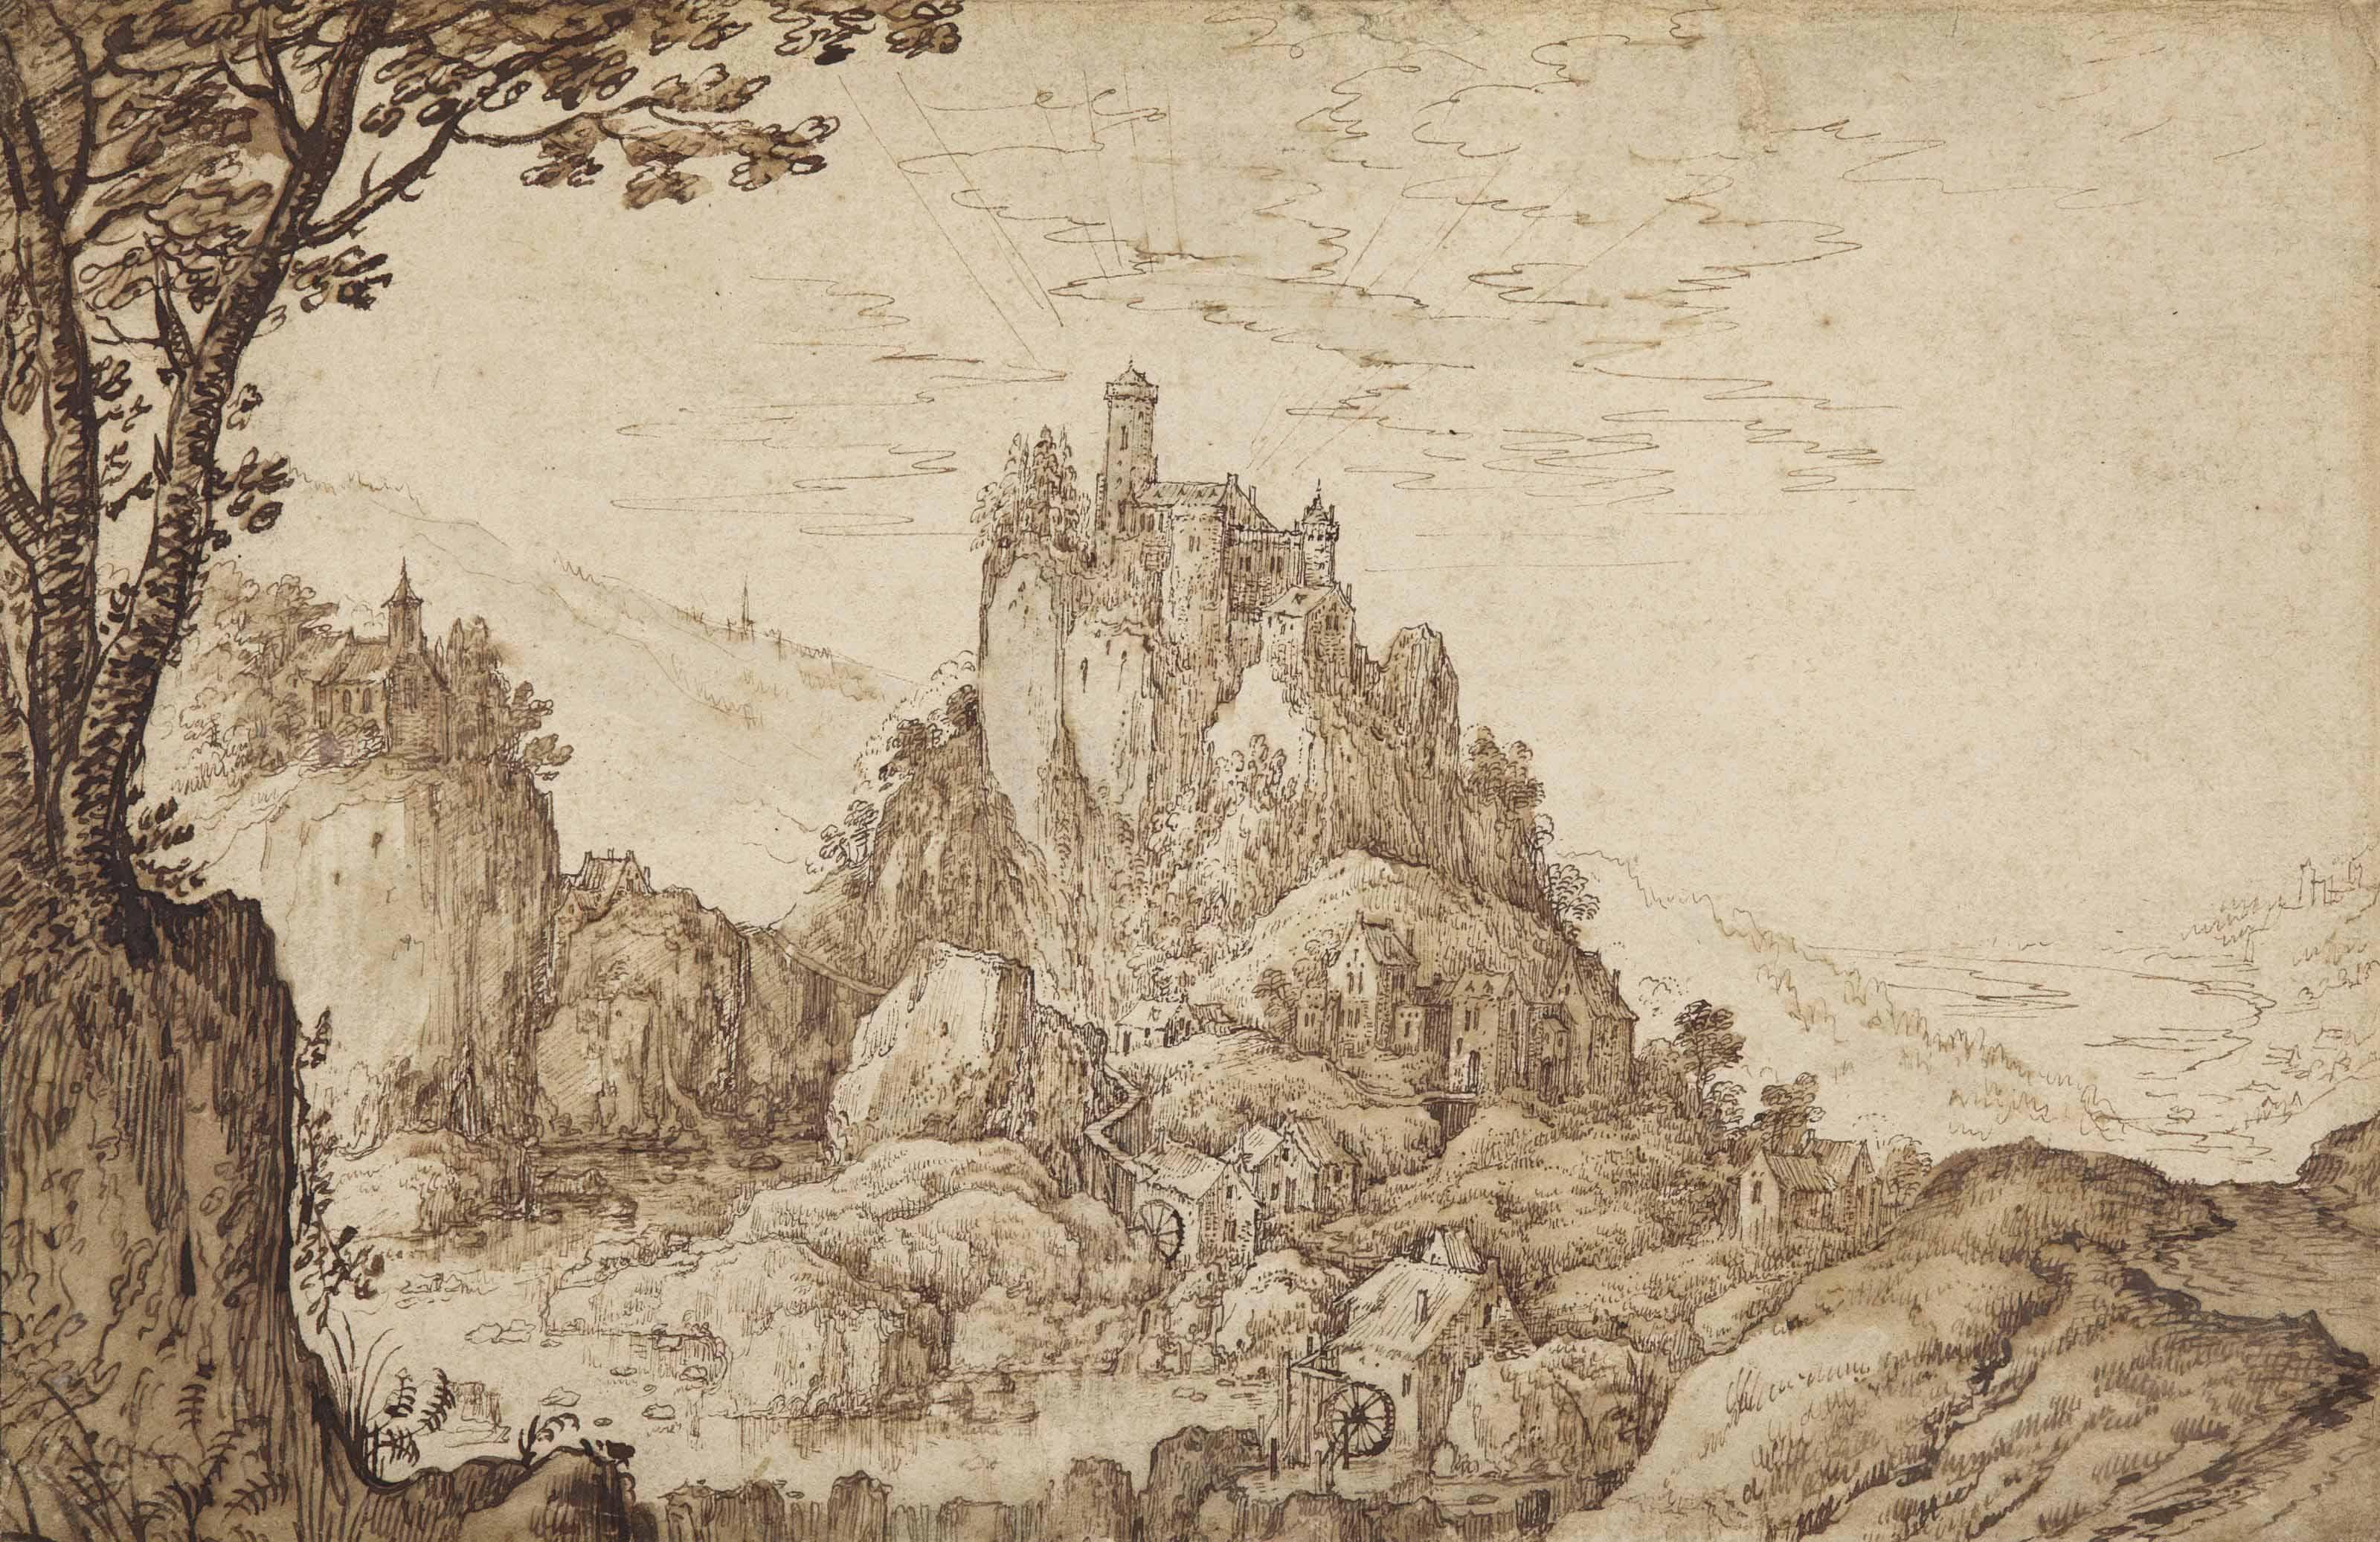 A castle on a crag in a mountainous landscape at sunrise